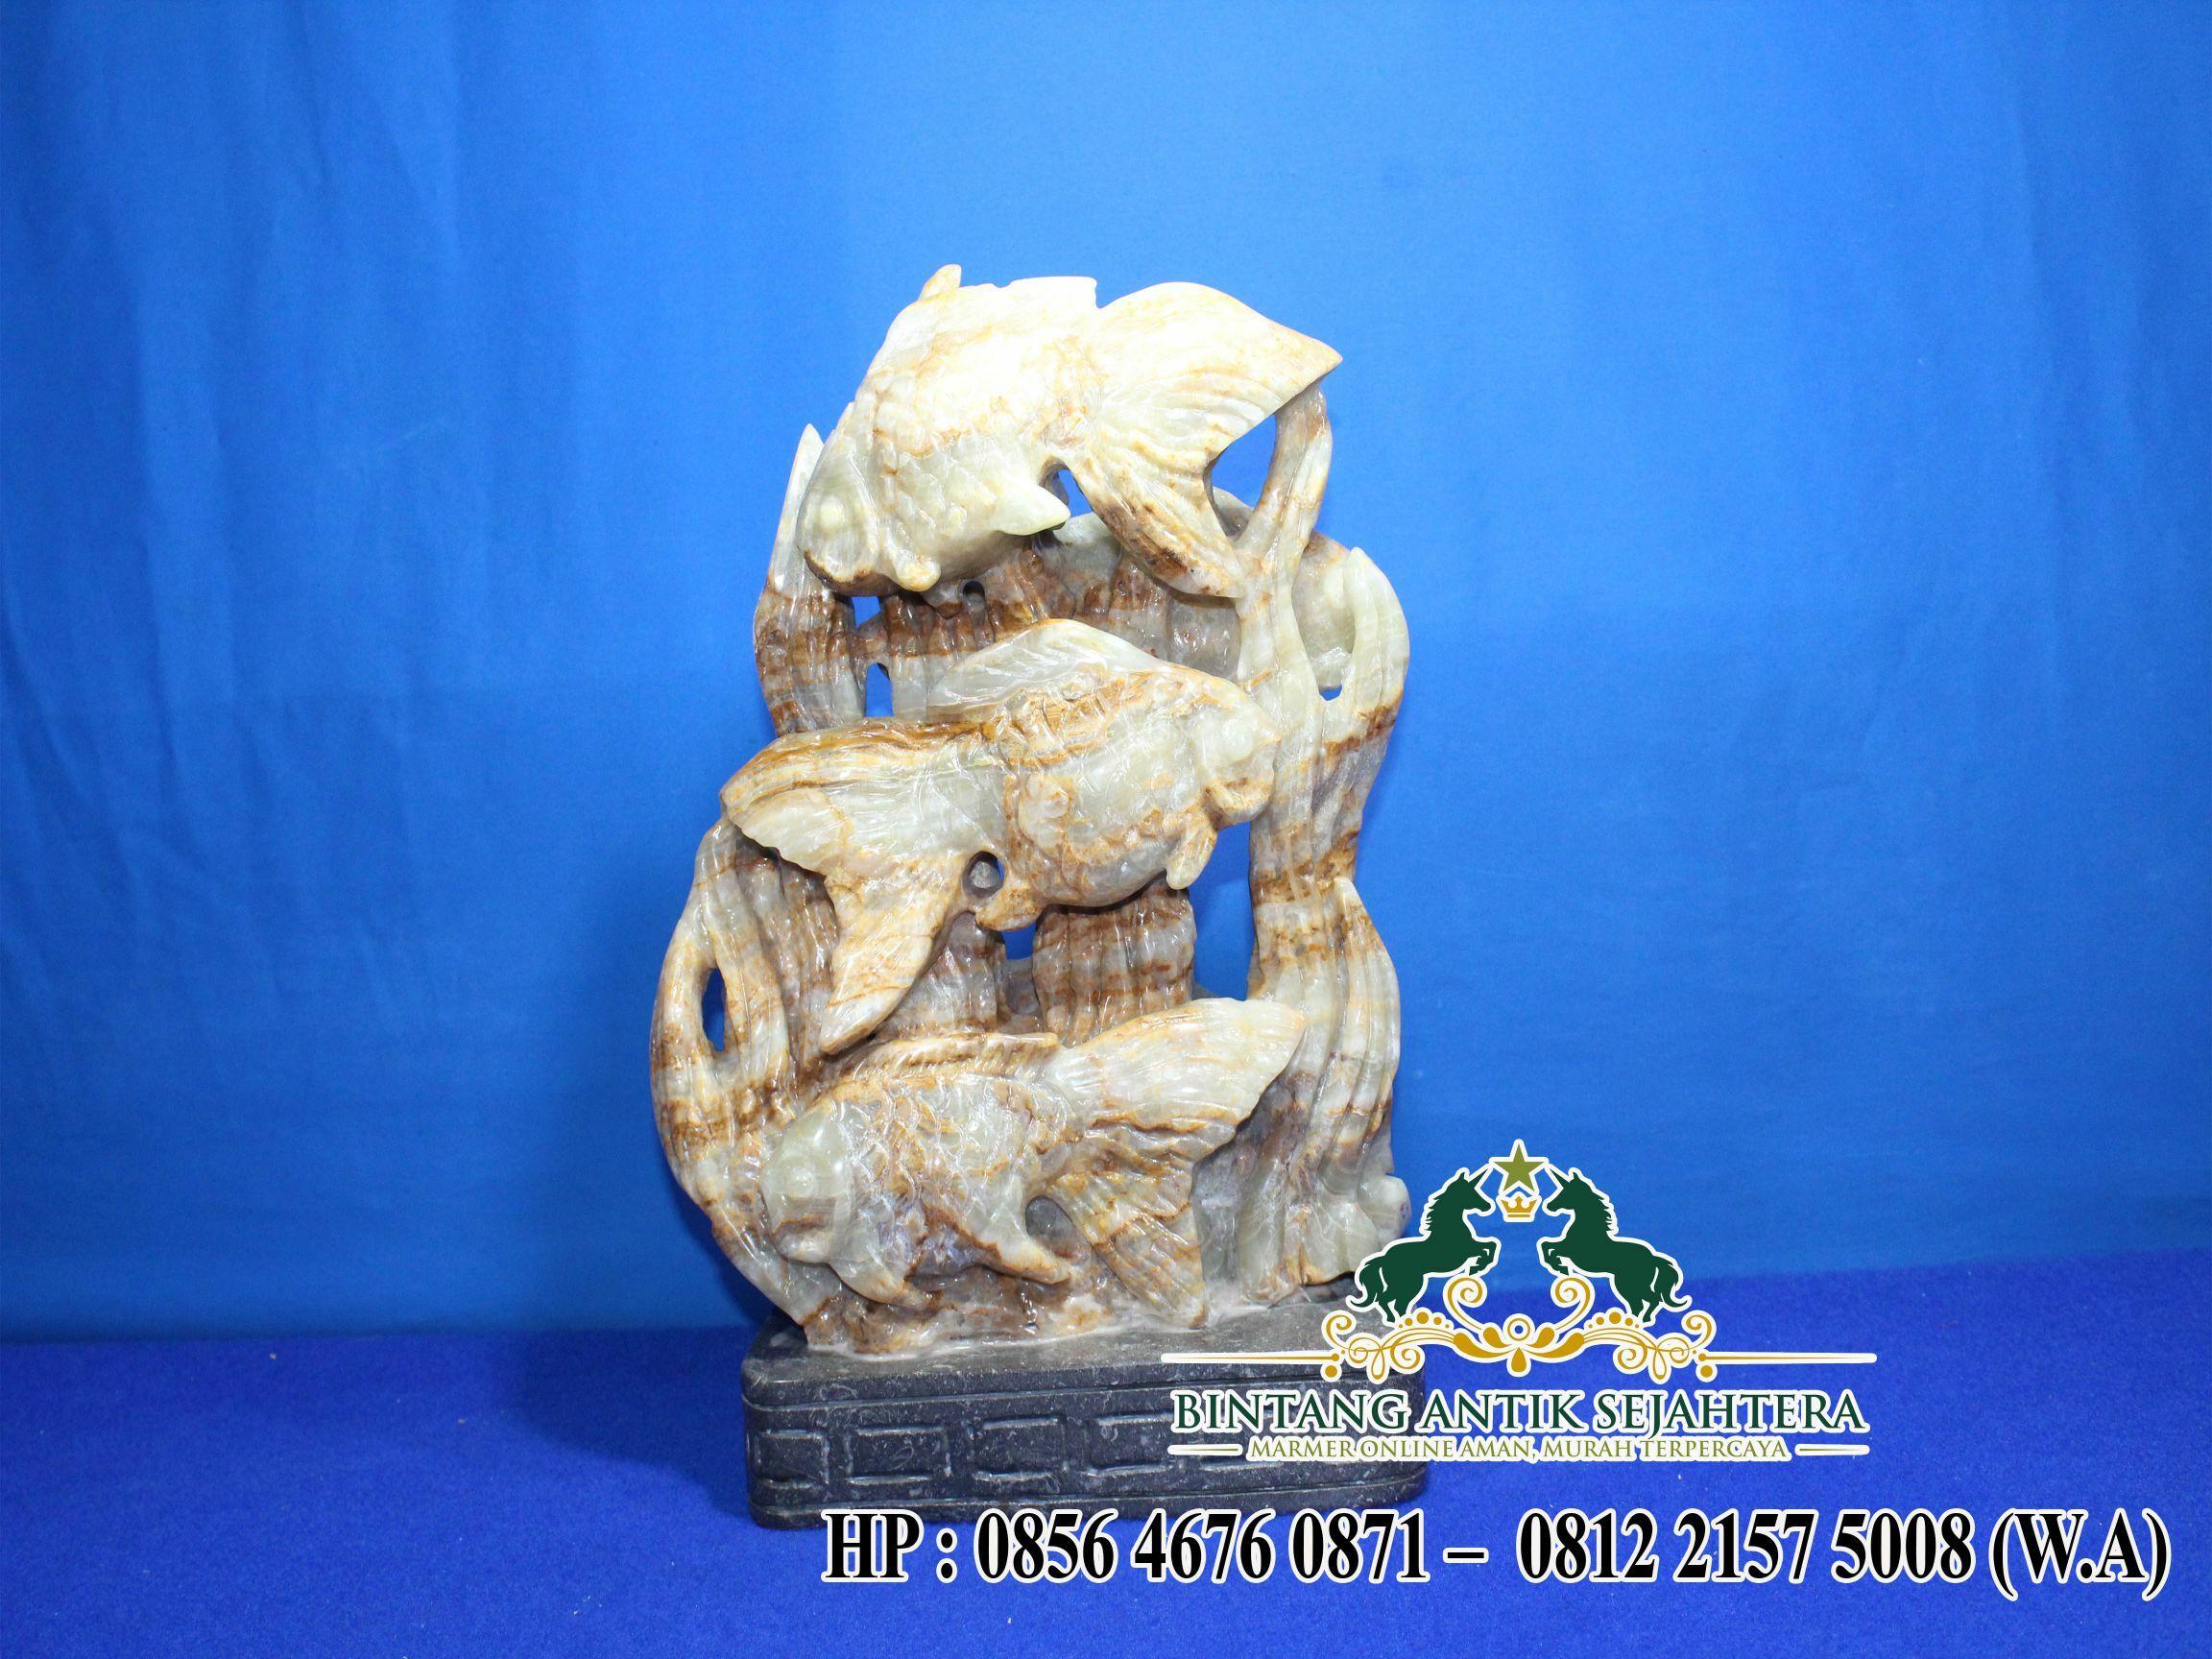 Jual Patung Marmer   Patung Onix